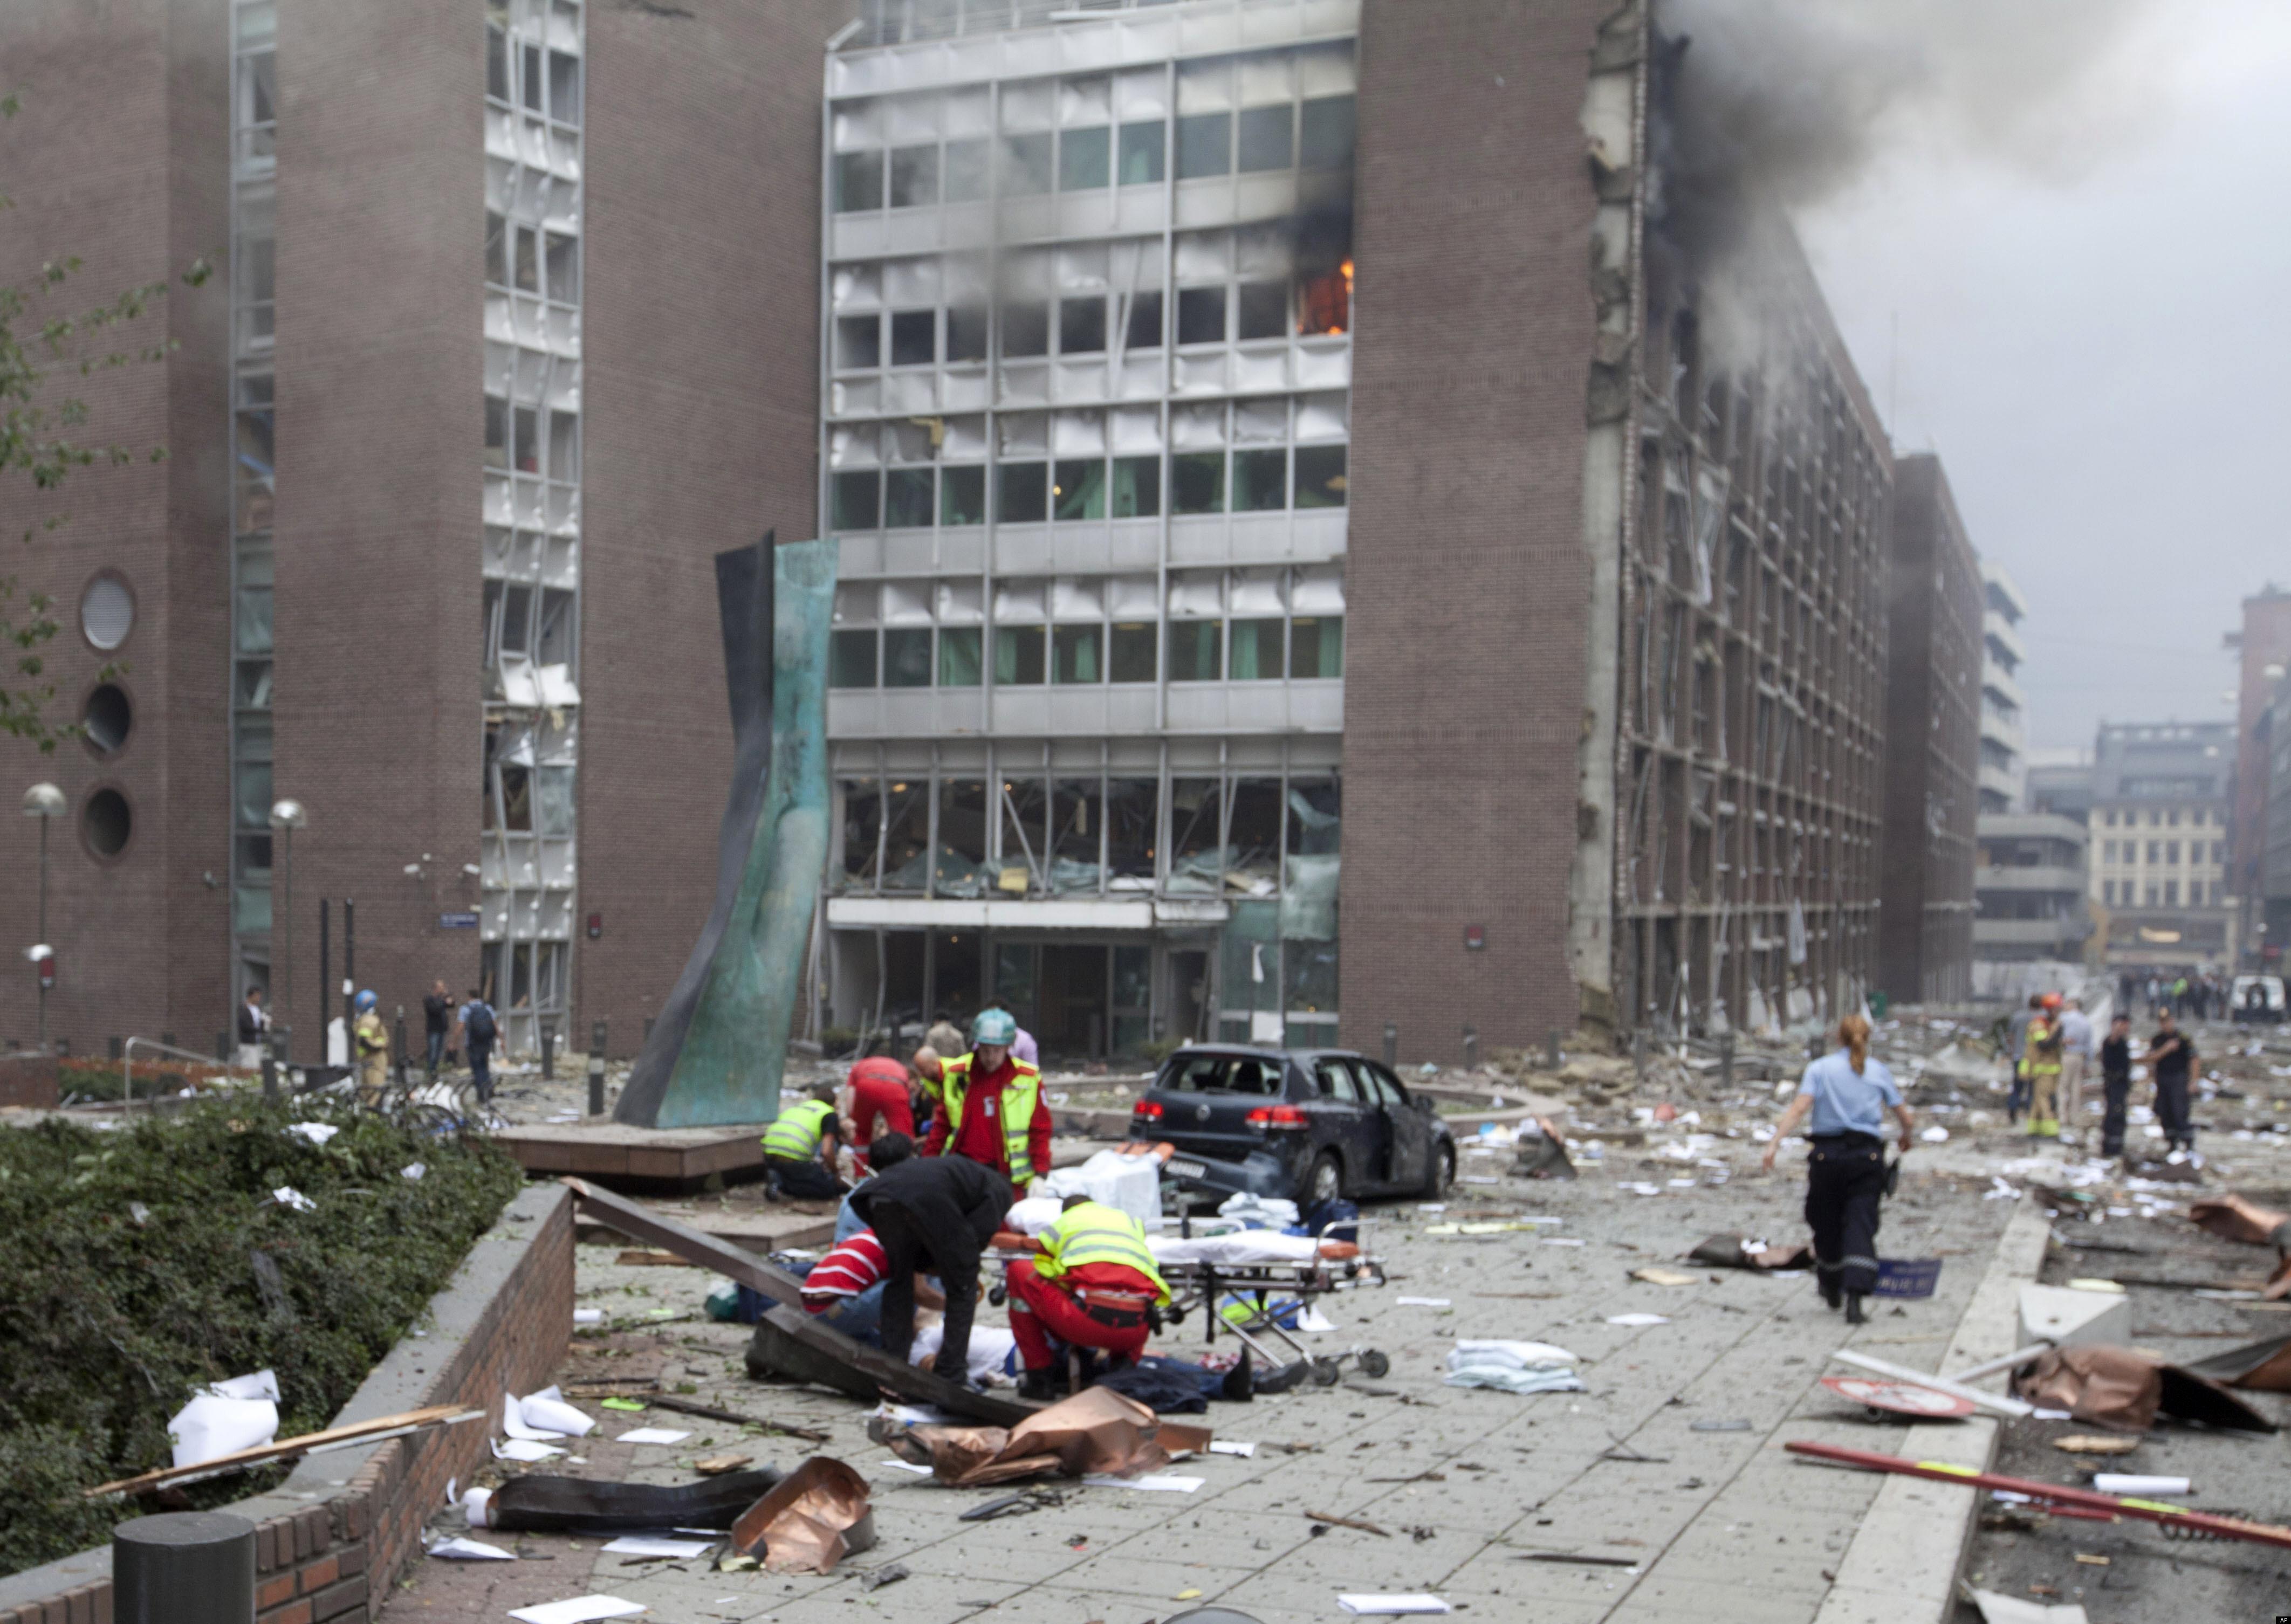 Oslo bomb area